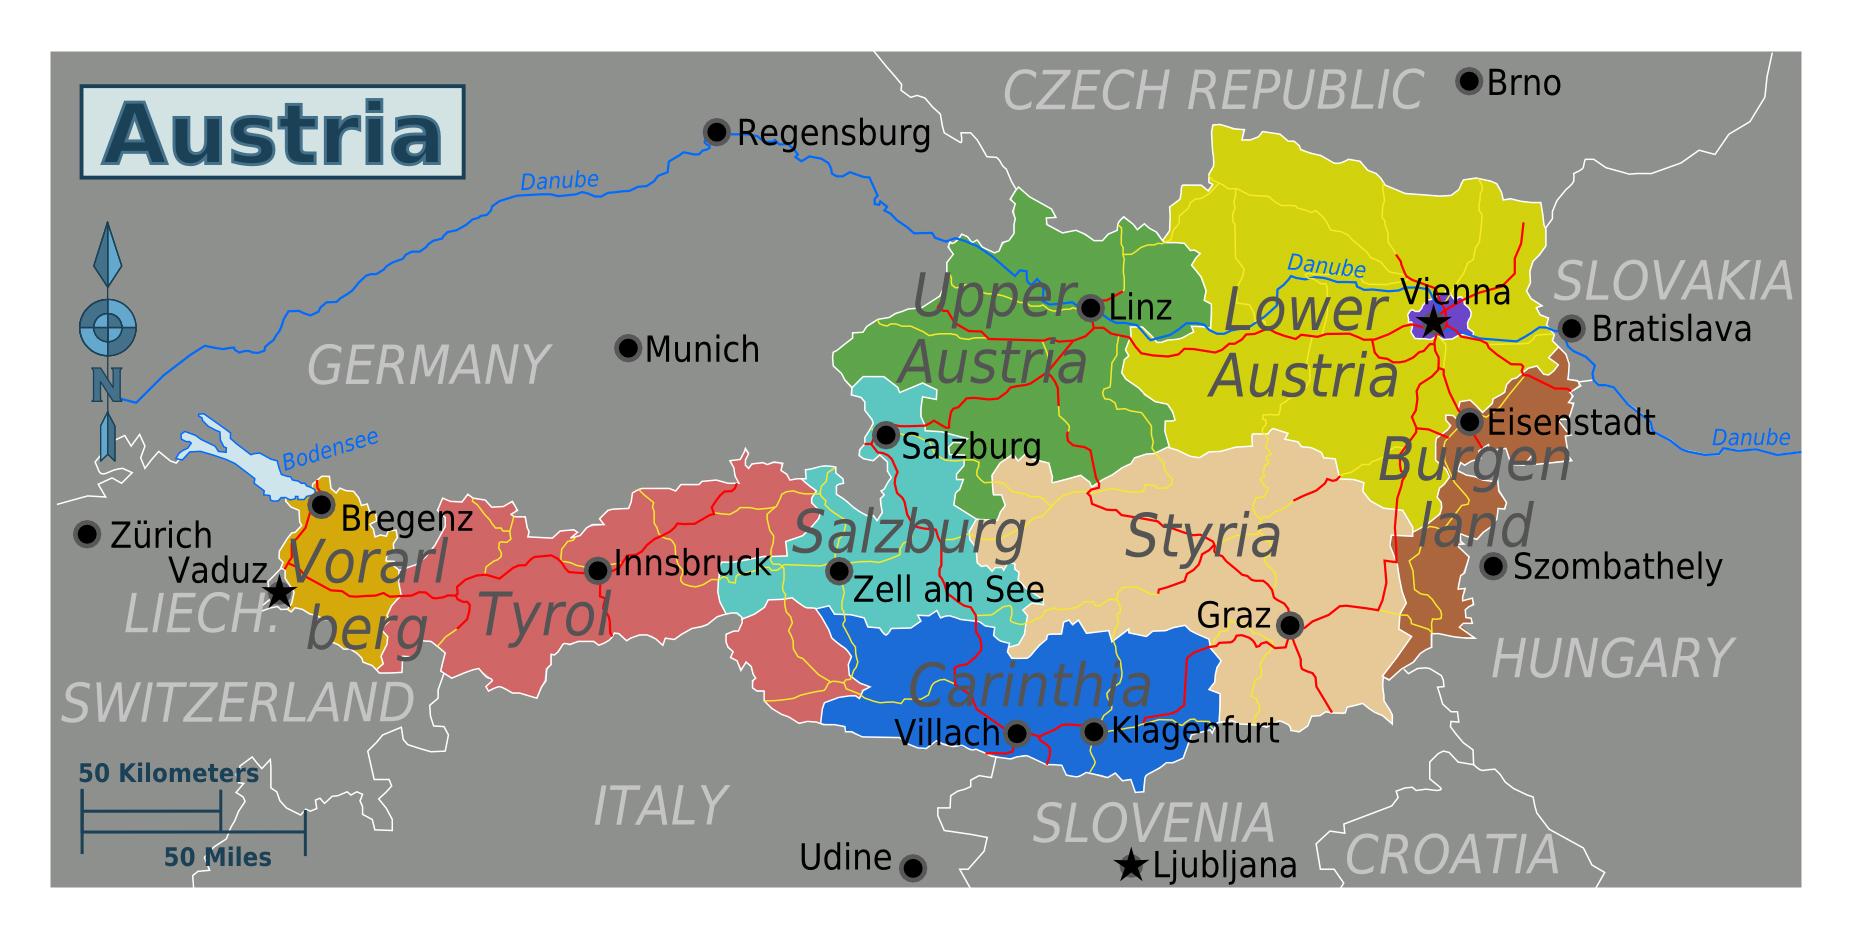 Large regions map of Austria Austria Europe Mapsland Maps of